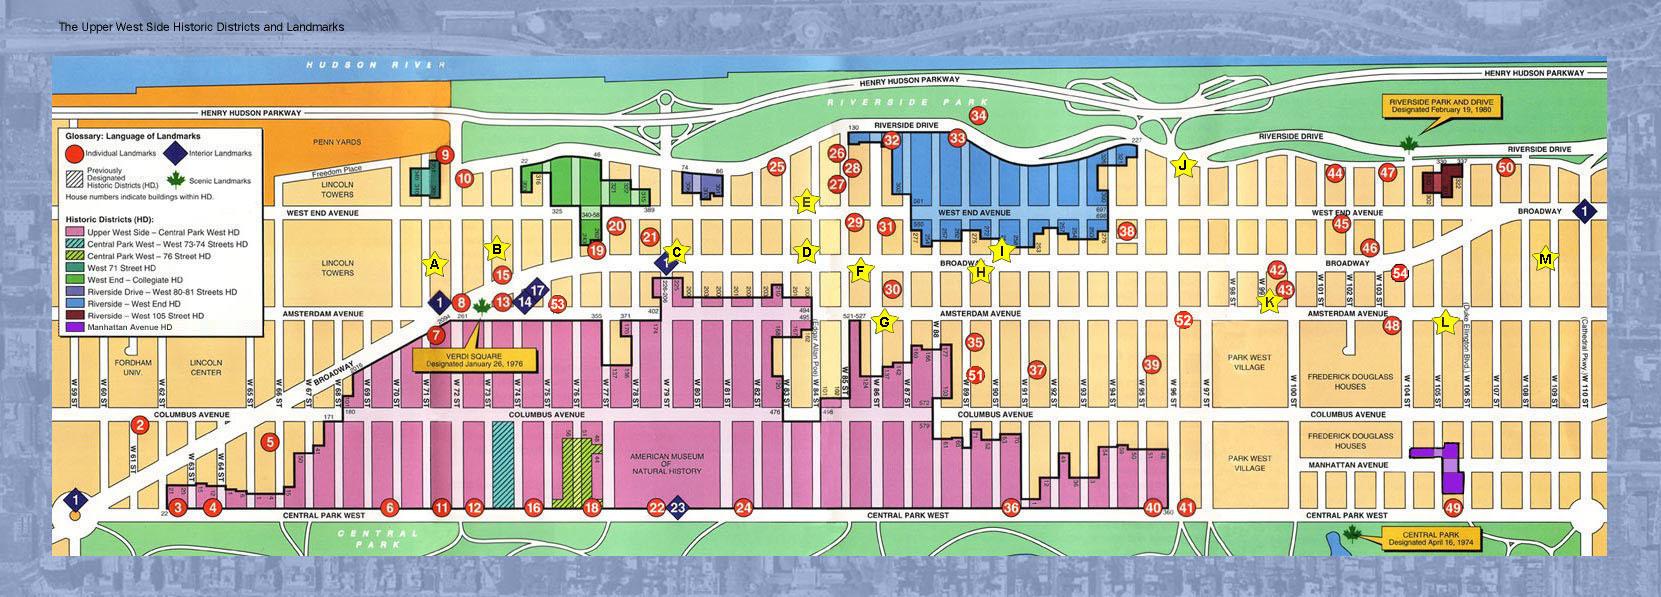 Printable Map Of Manhattan Nyc Manhattan Street Map Printable - Map Of Manhattan Nyc Printable